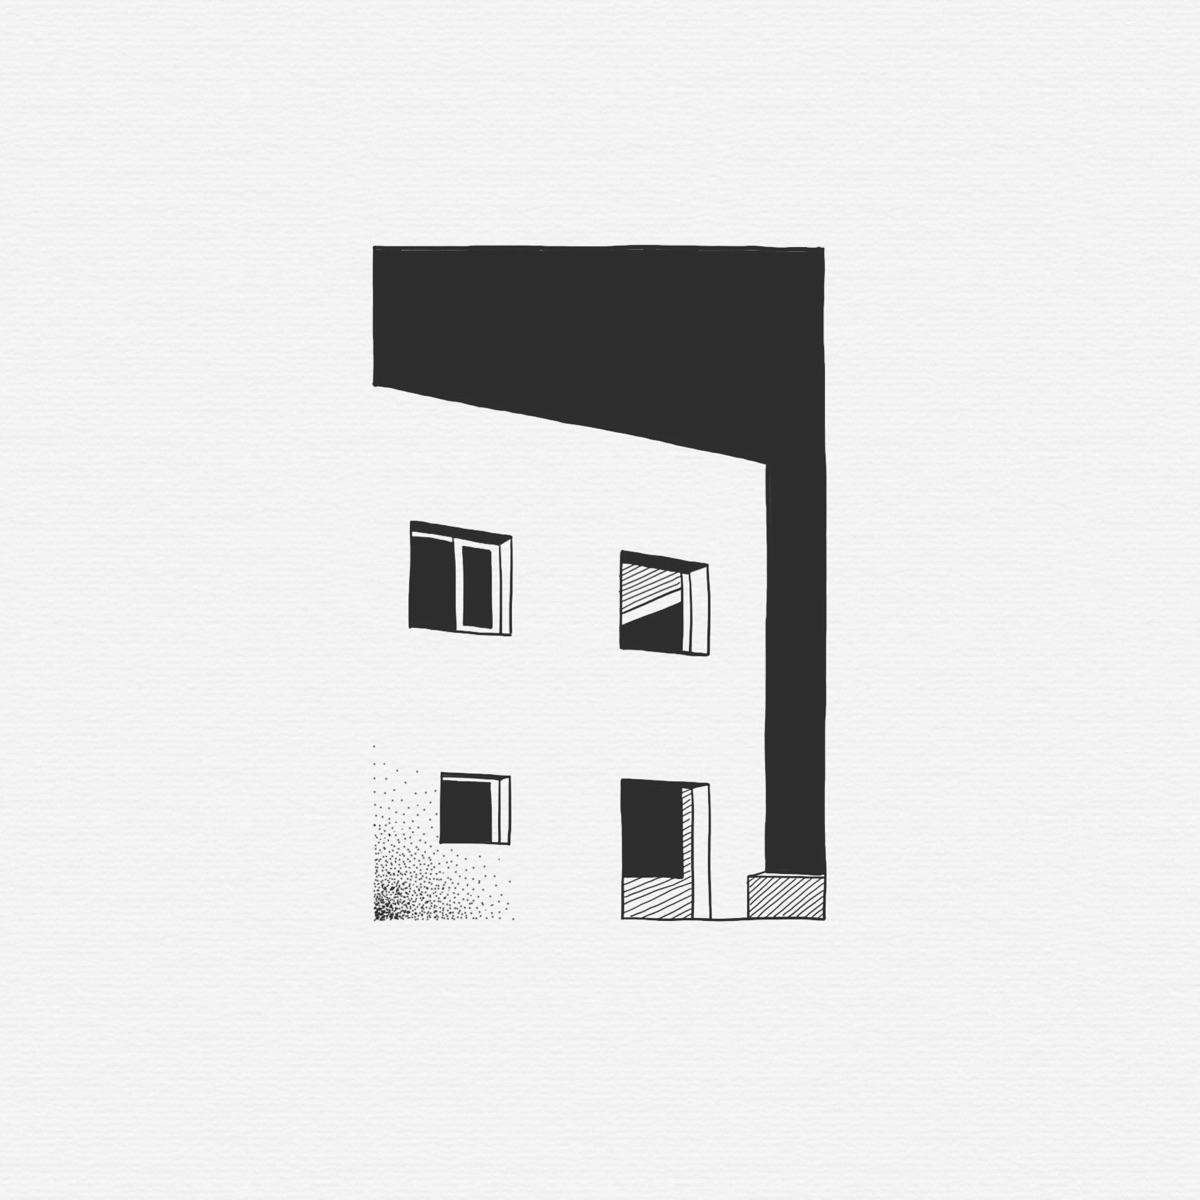 Architekturmontag.  - architectureporn - heiniistgegenalles | ello